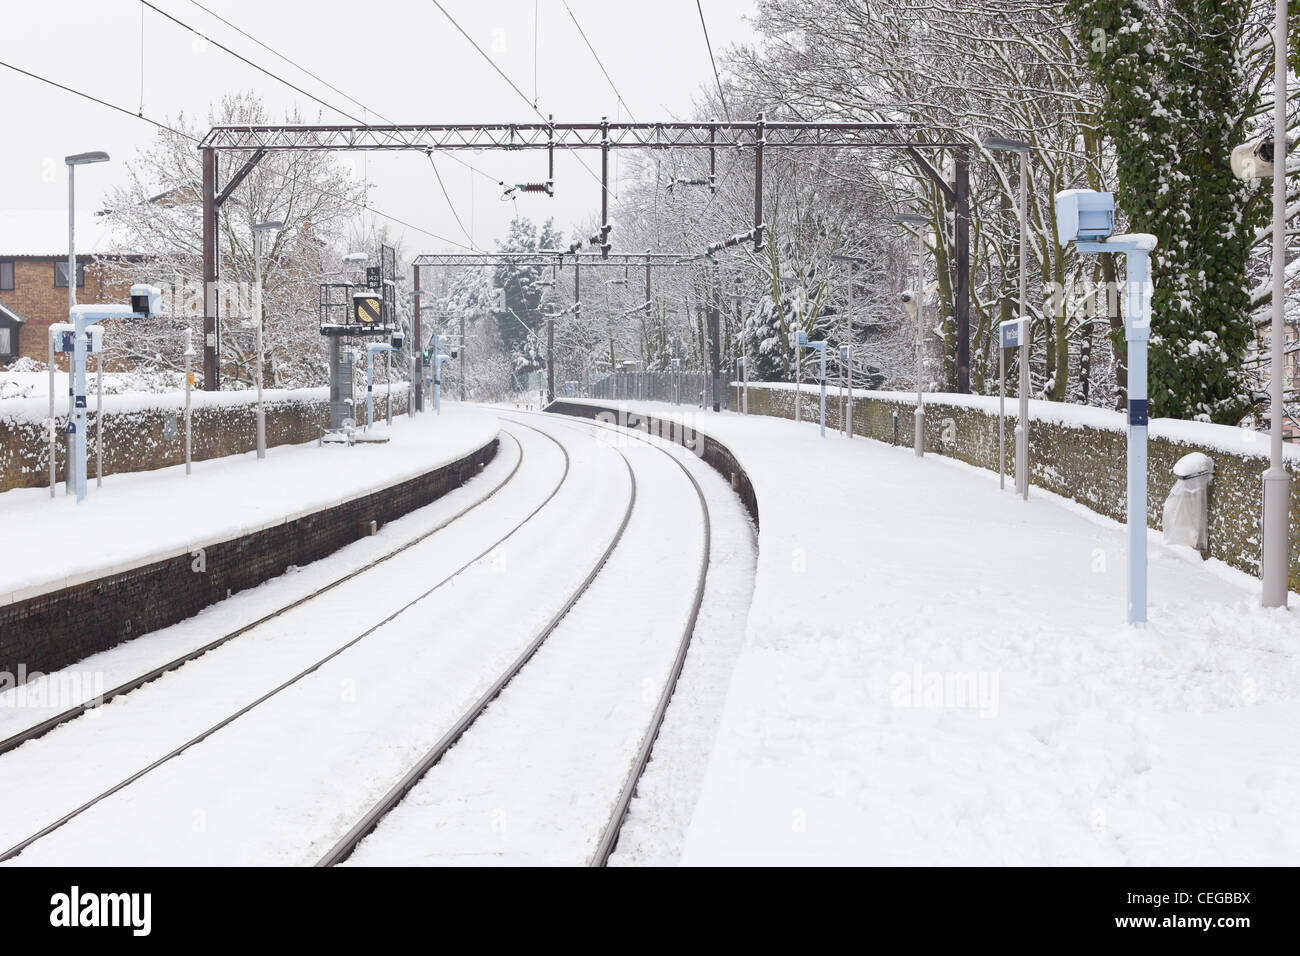 Railway lines with snow, UK - Stock Image